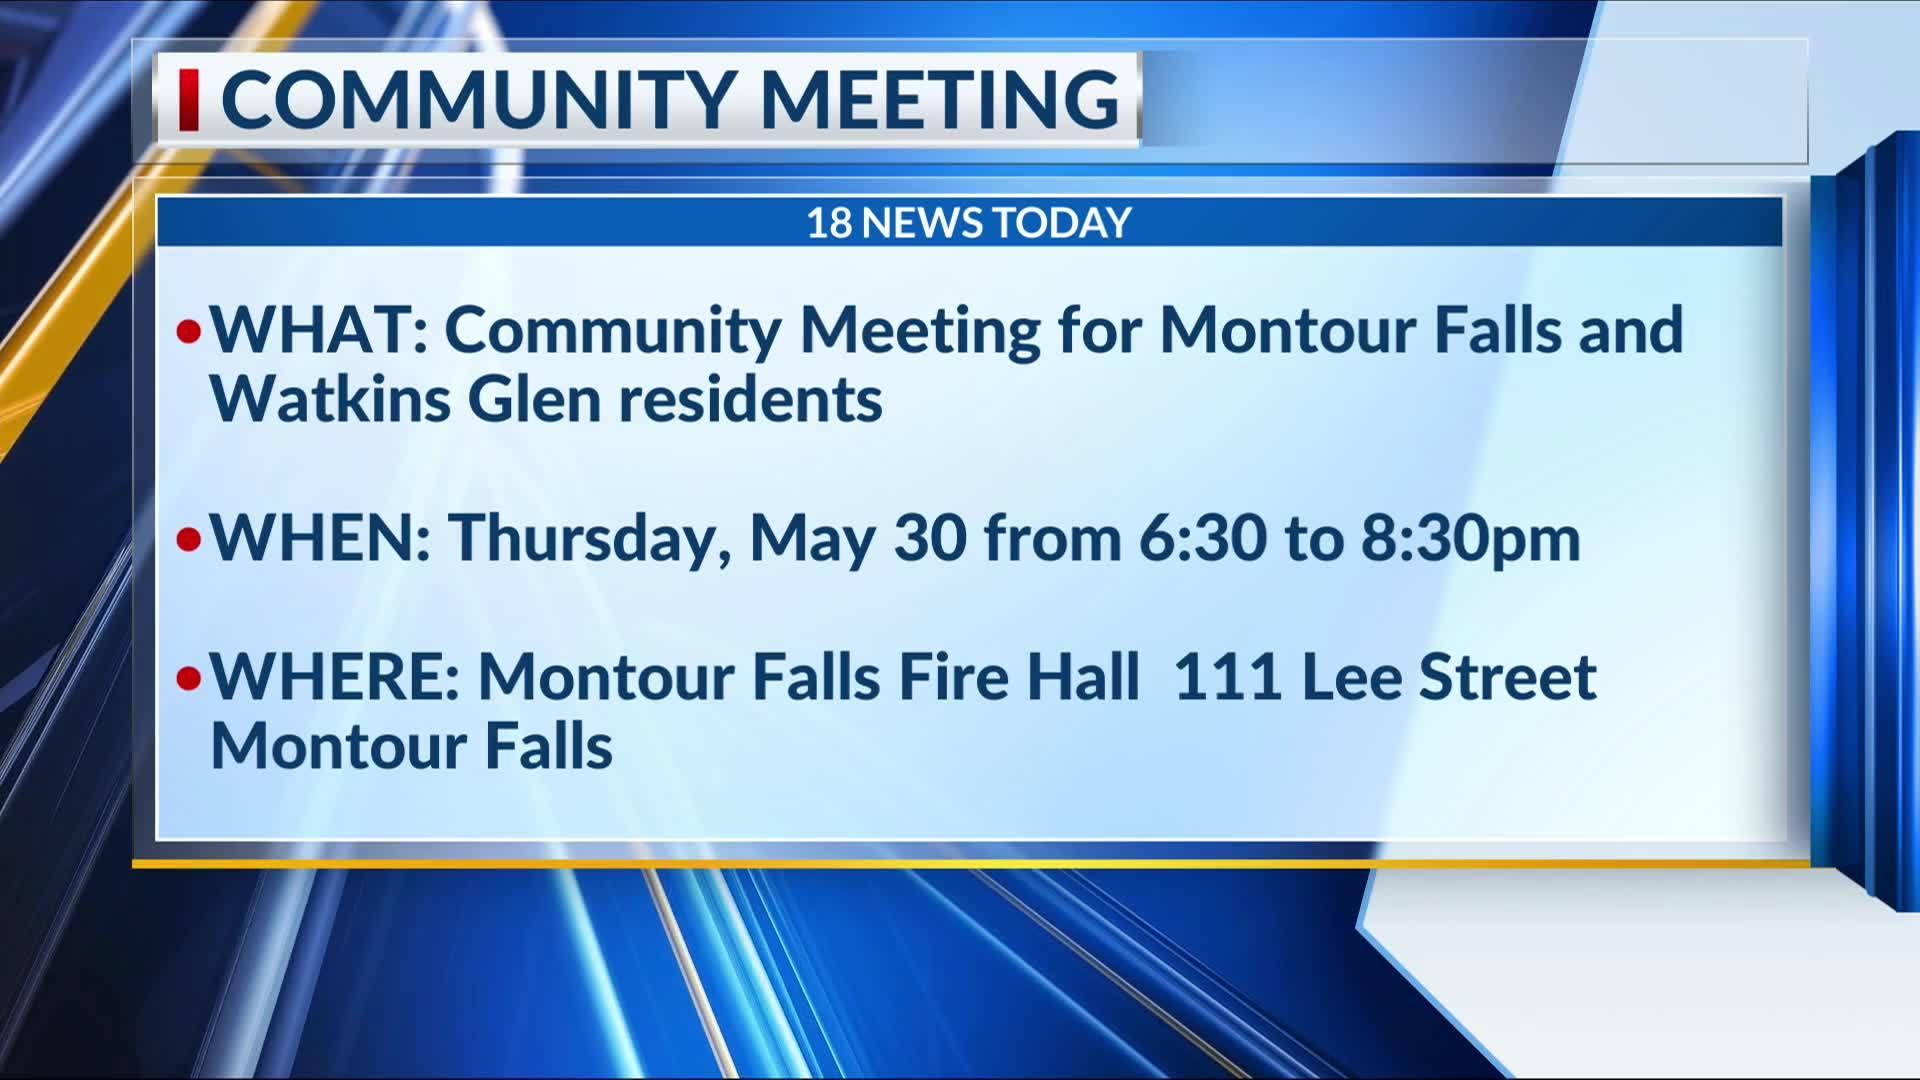 montour_falls_community_meeting_6_20190530115759